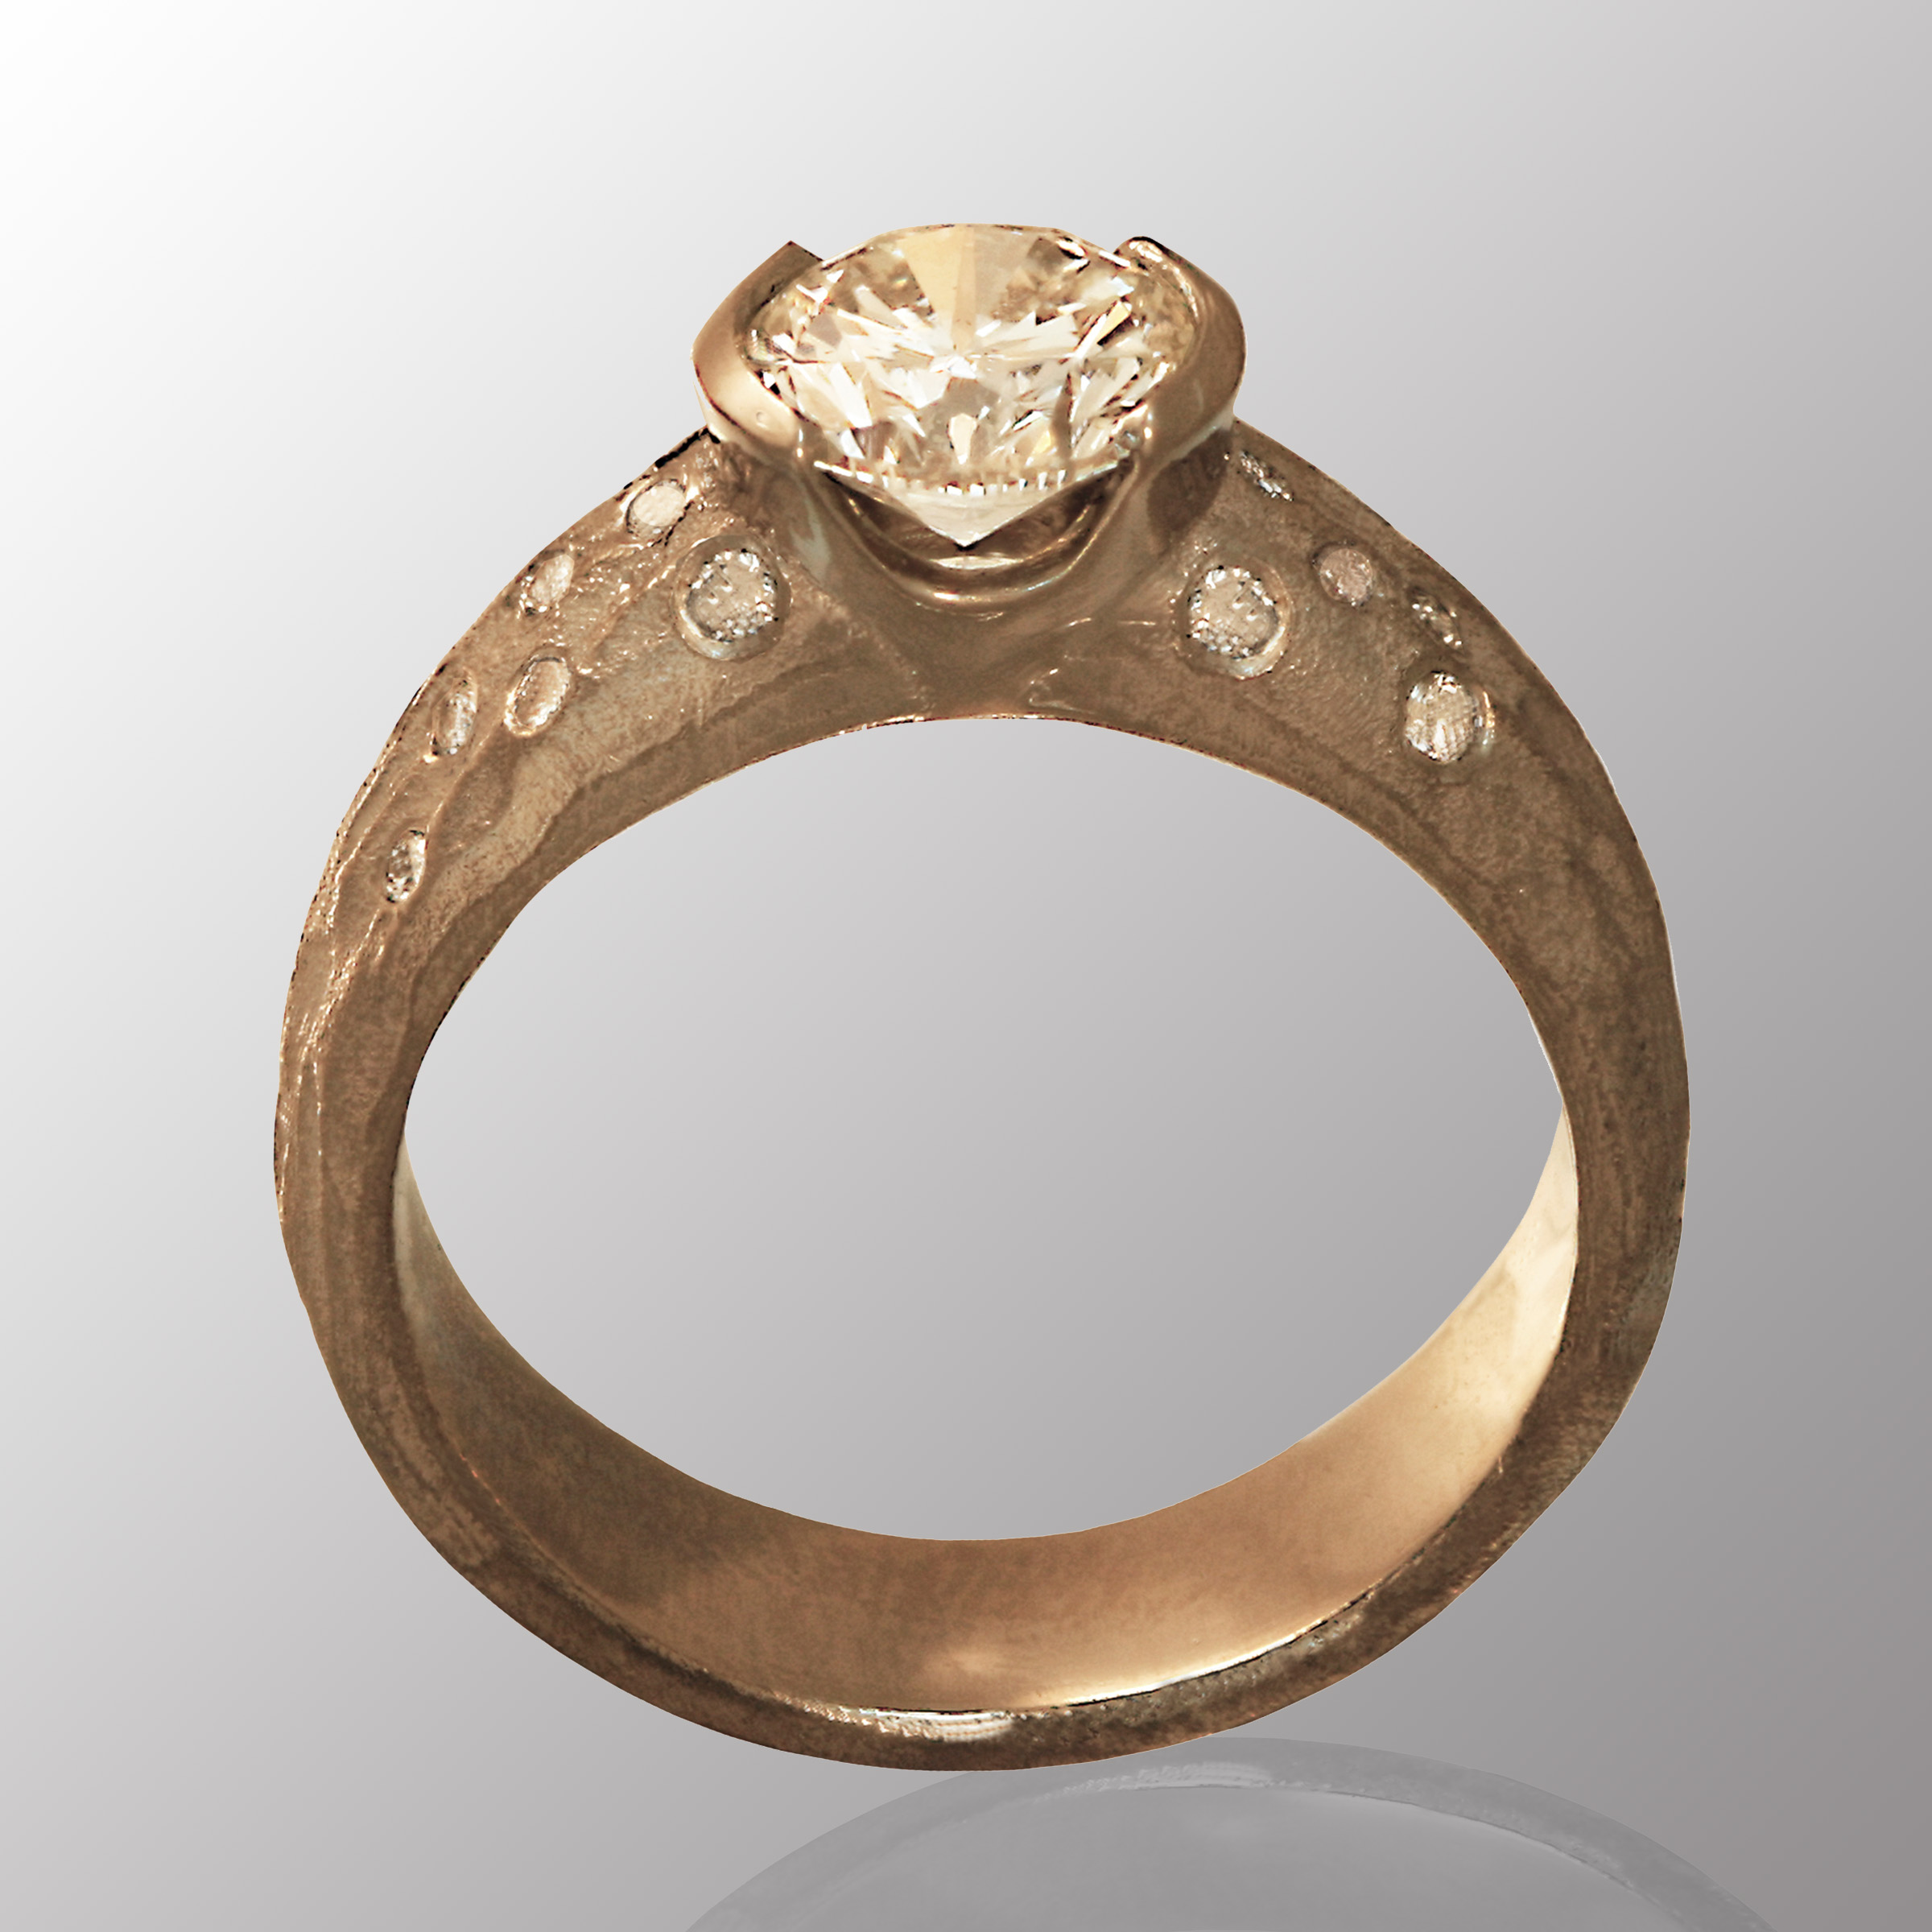 Dejan Studio Jewelry Blog Specializing In Custom Wedding Bands